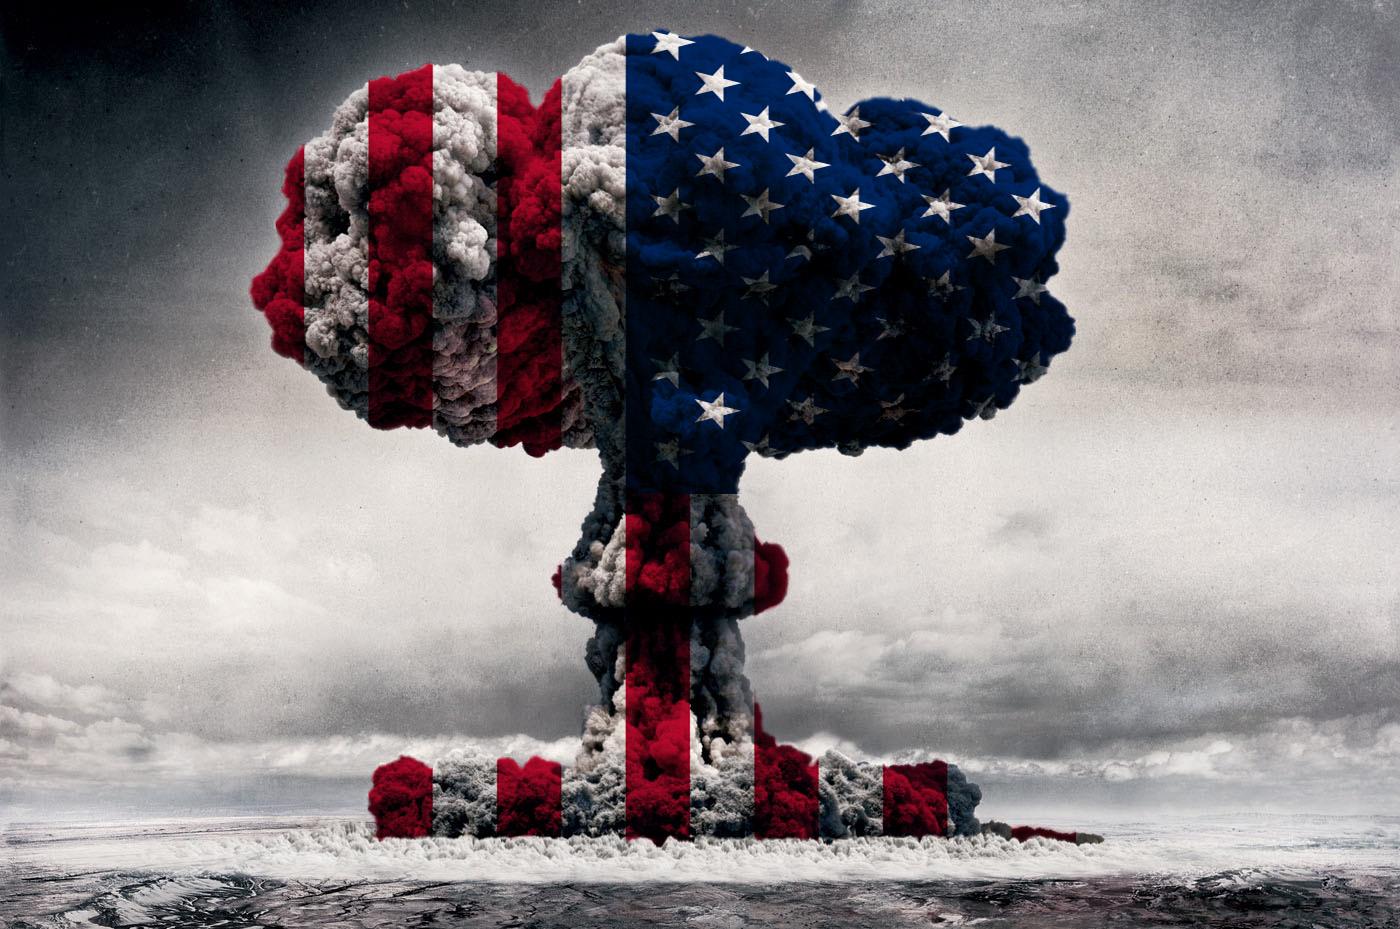 American Art of War by Konton-Kyoudai